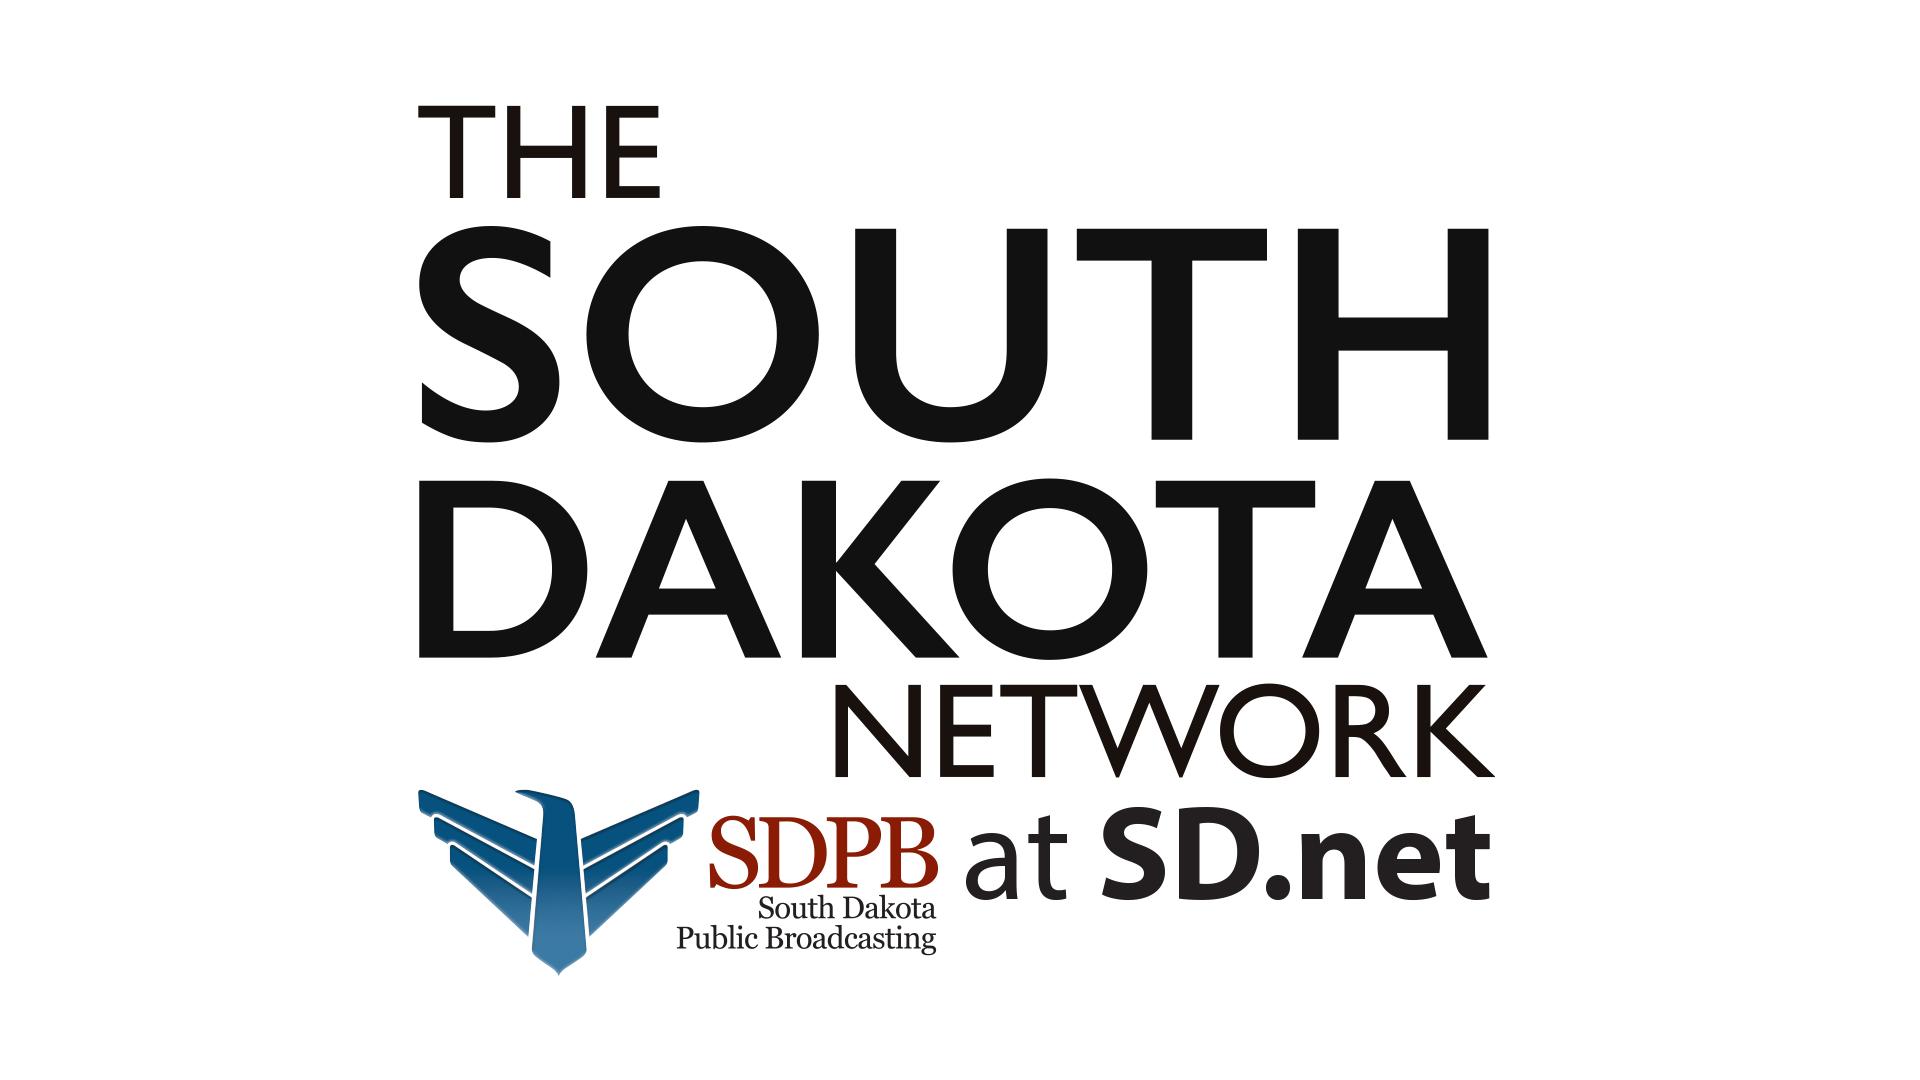 SDPB SD/Net